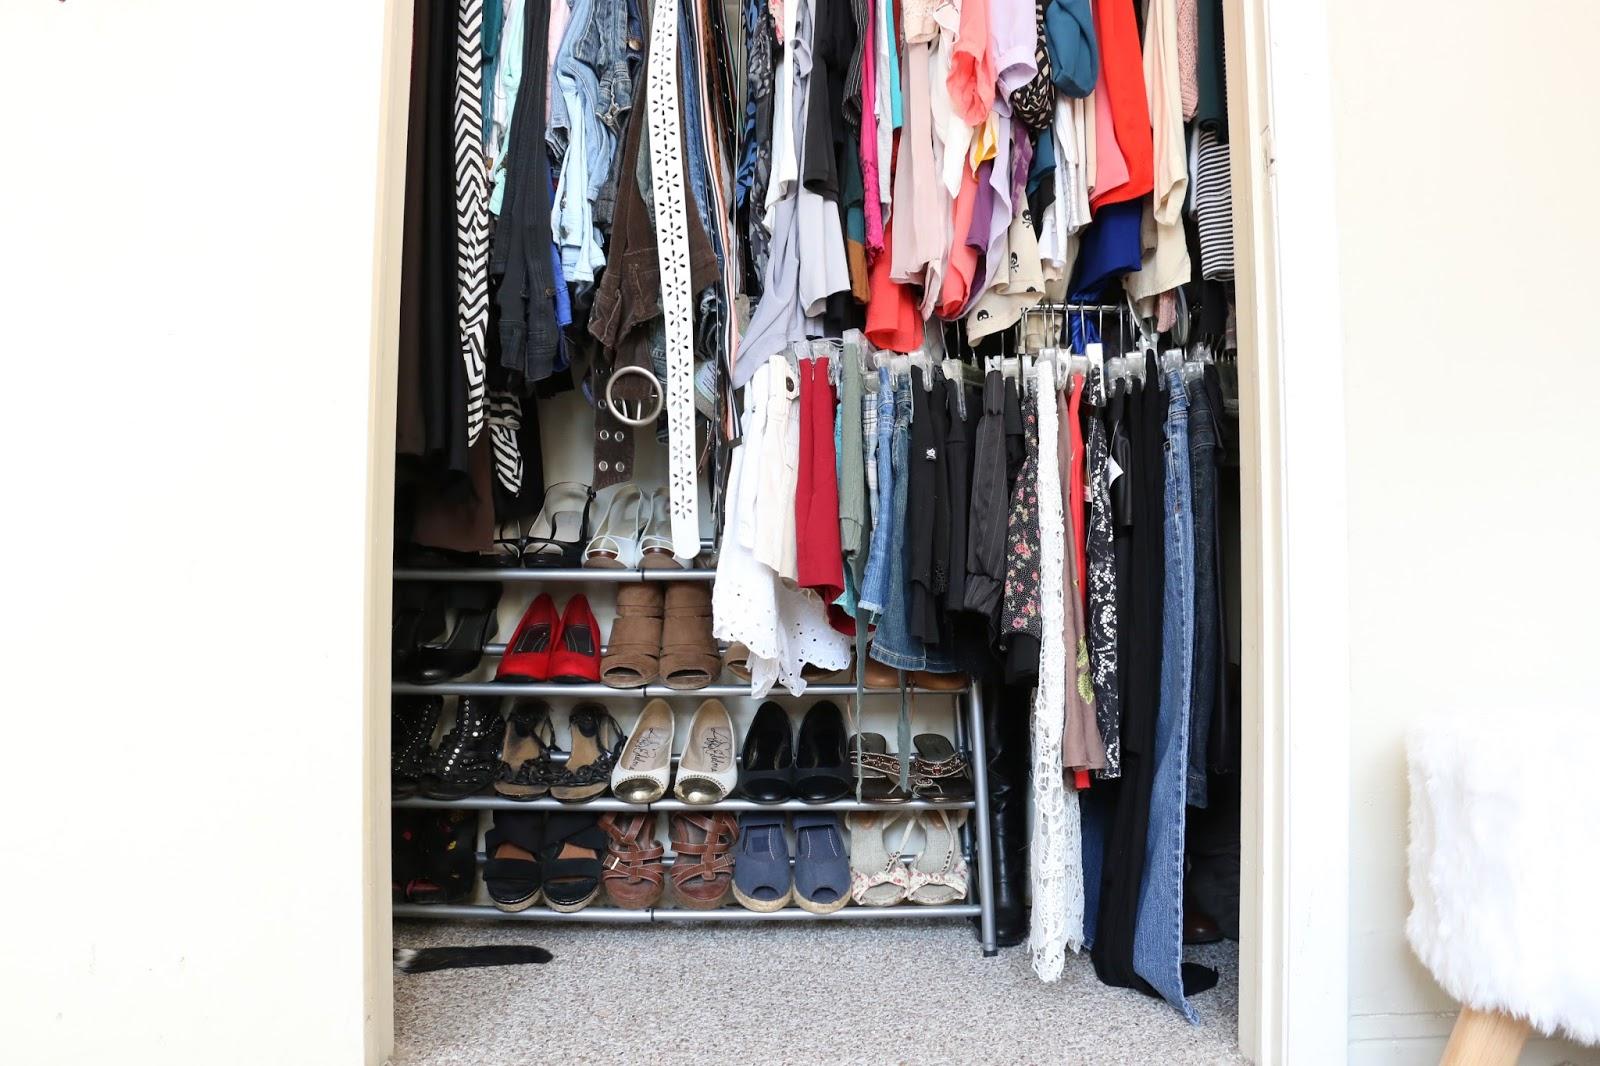 tica kasa de para camisa pr capa organizadores organizador closet